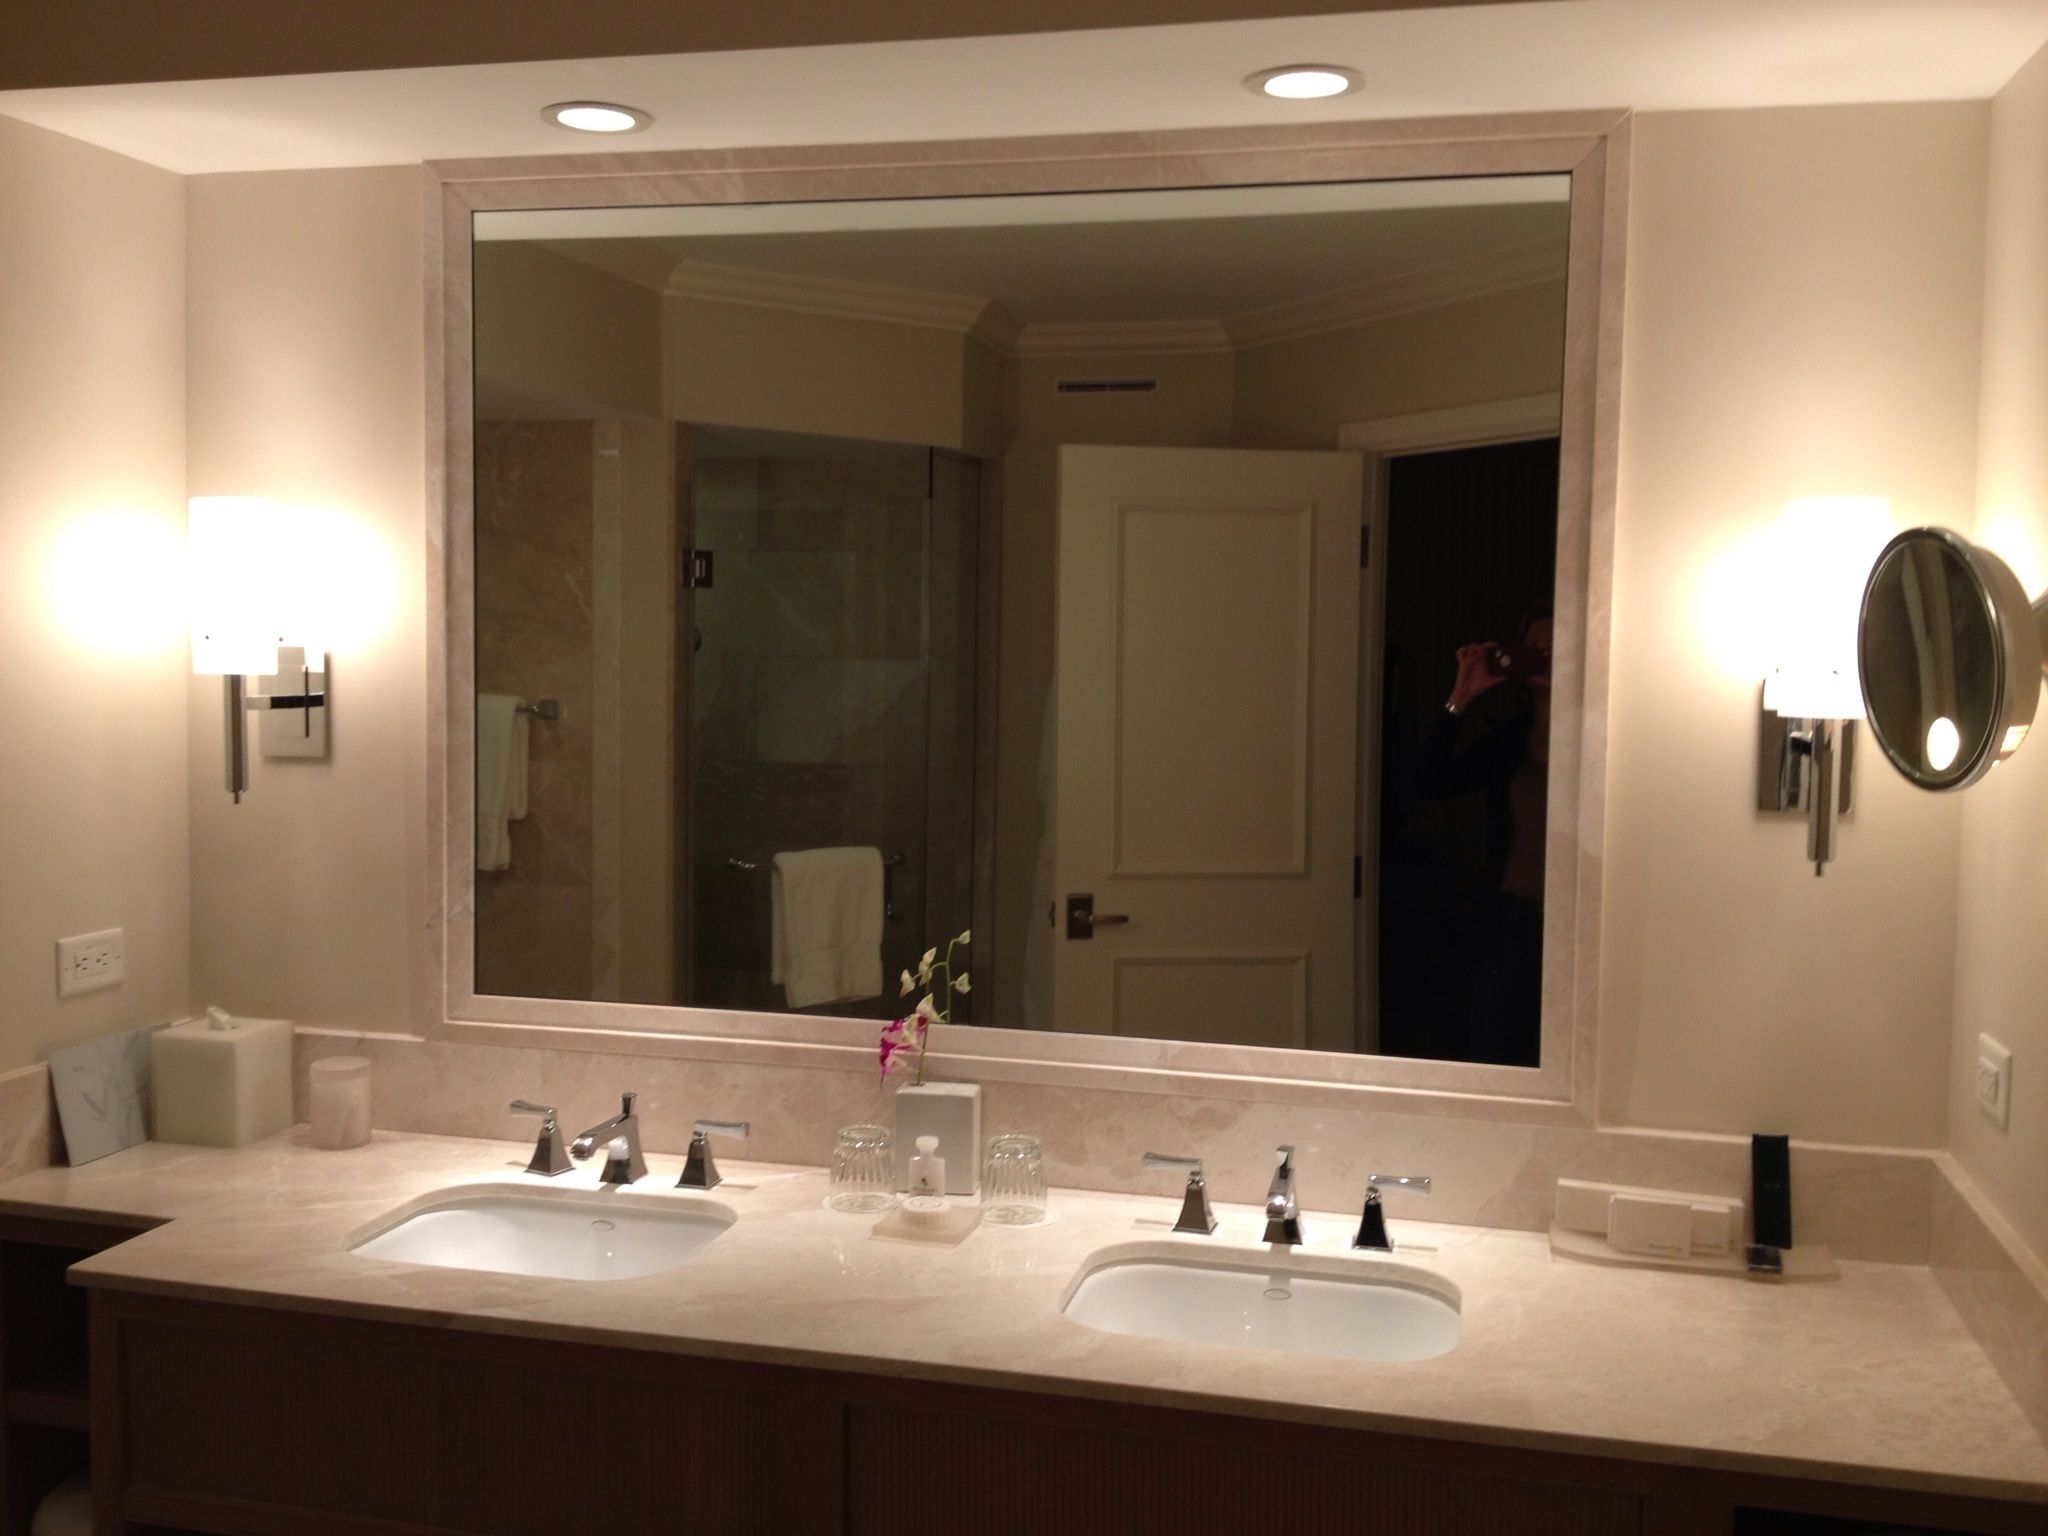 Bathroom at Four Seasons, Palm Beach   Interior likes   Pinterest ...